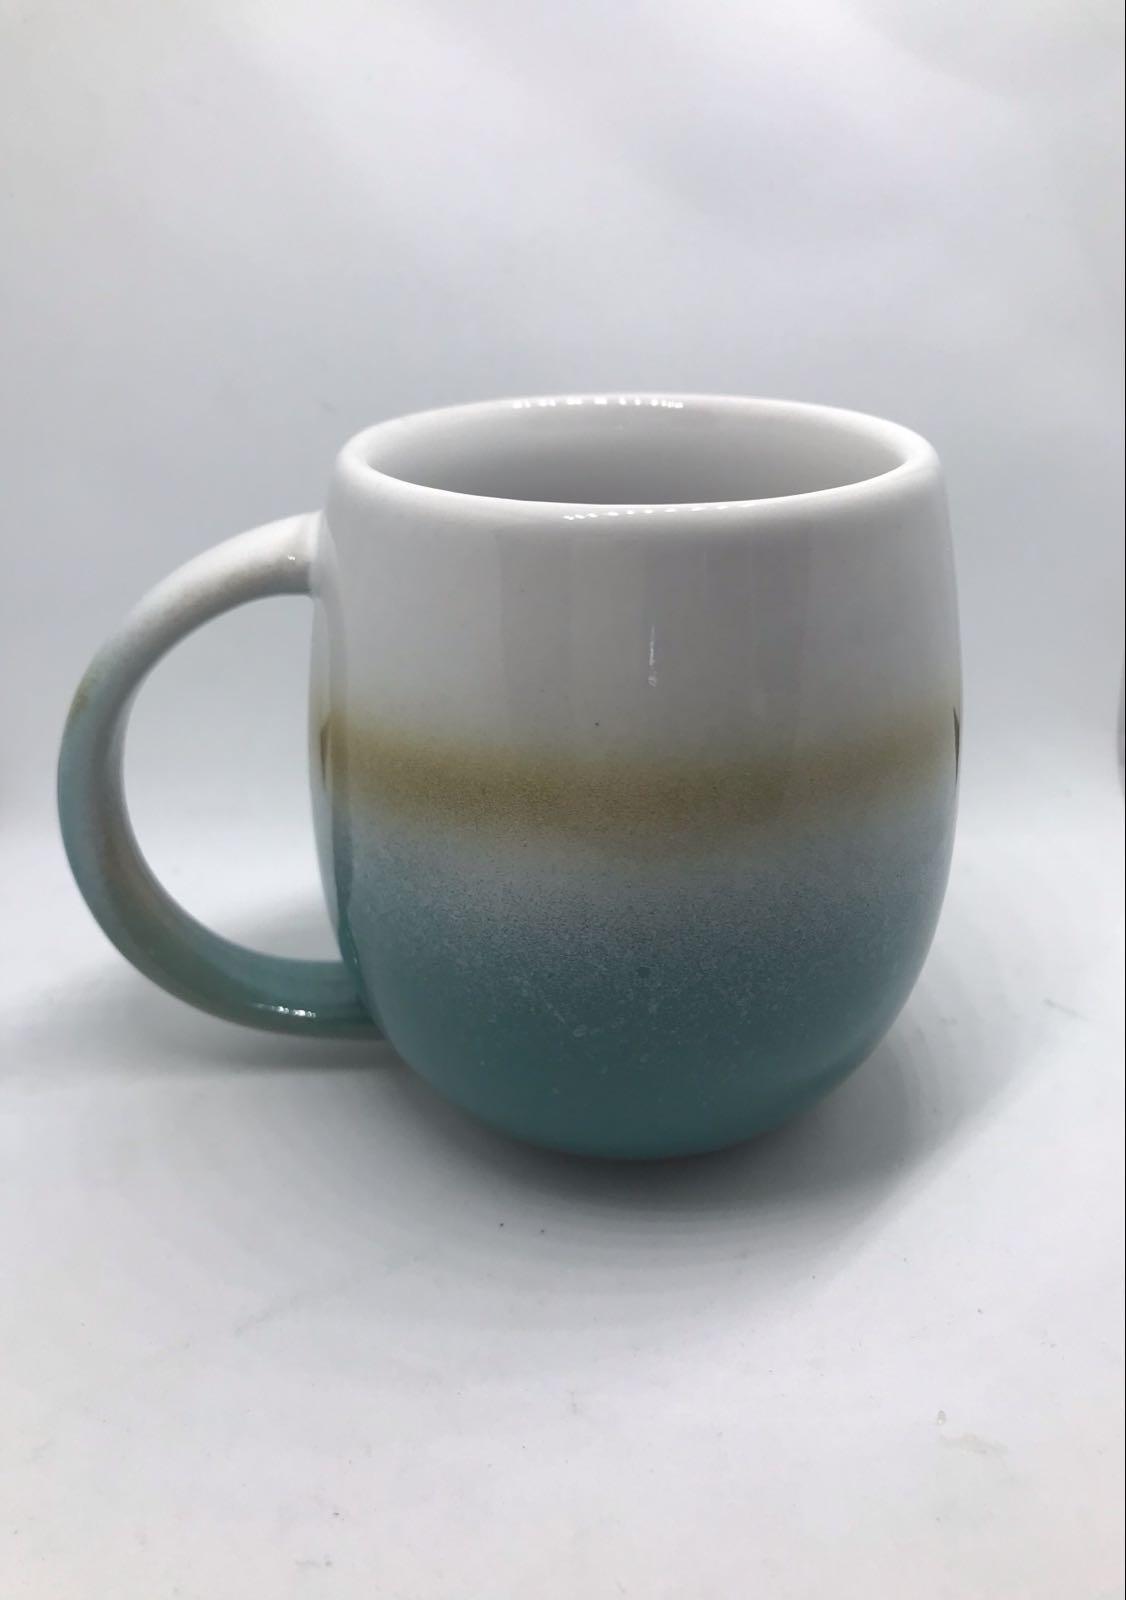 Ombre turquoise mug